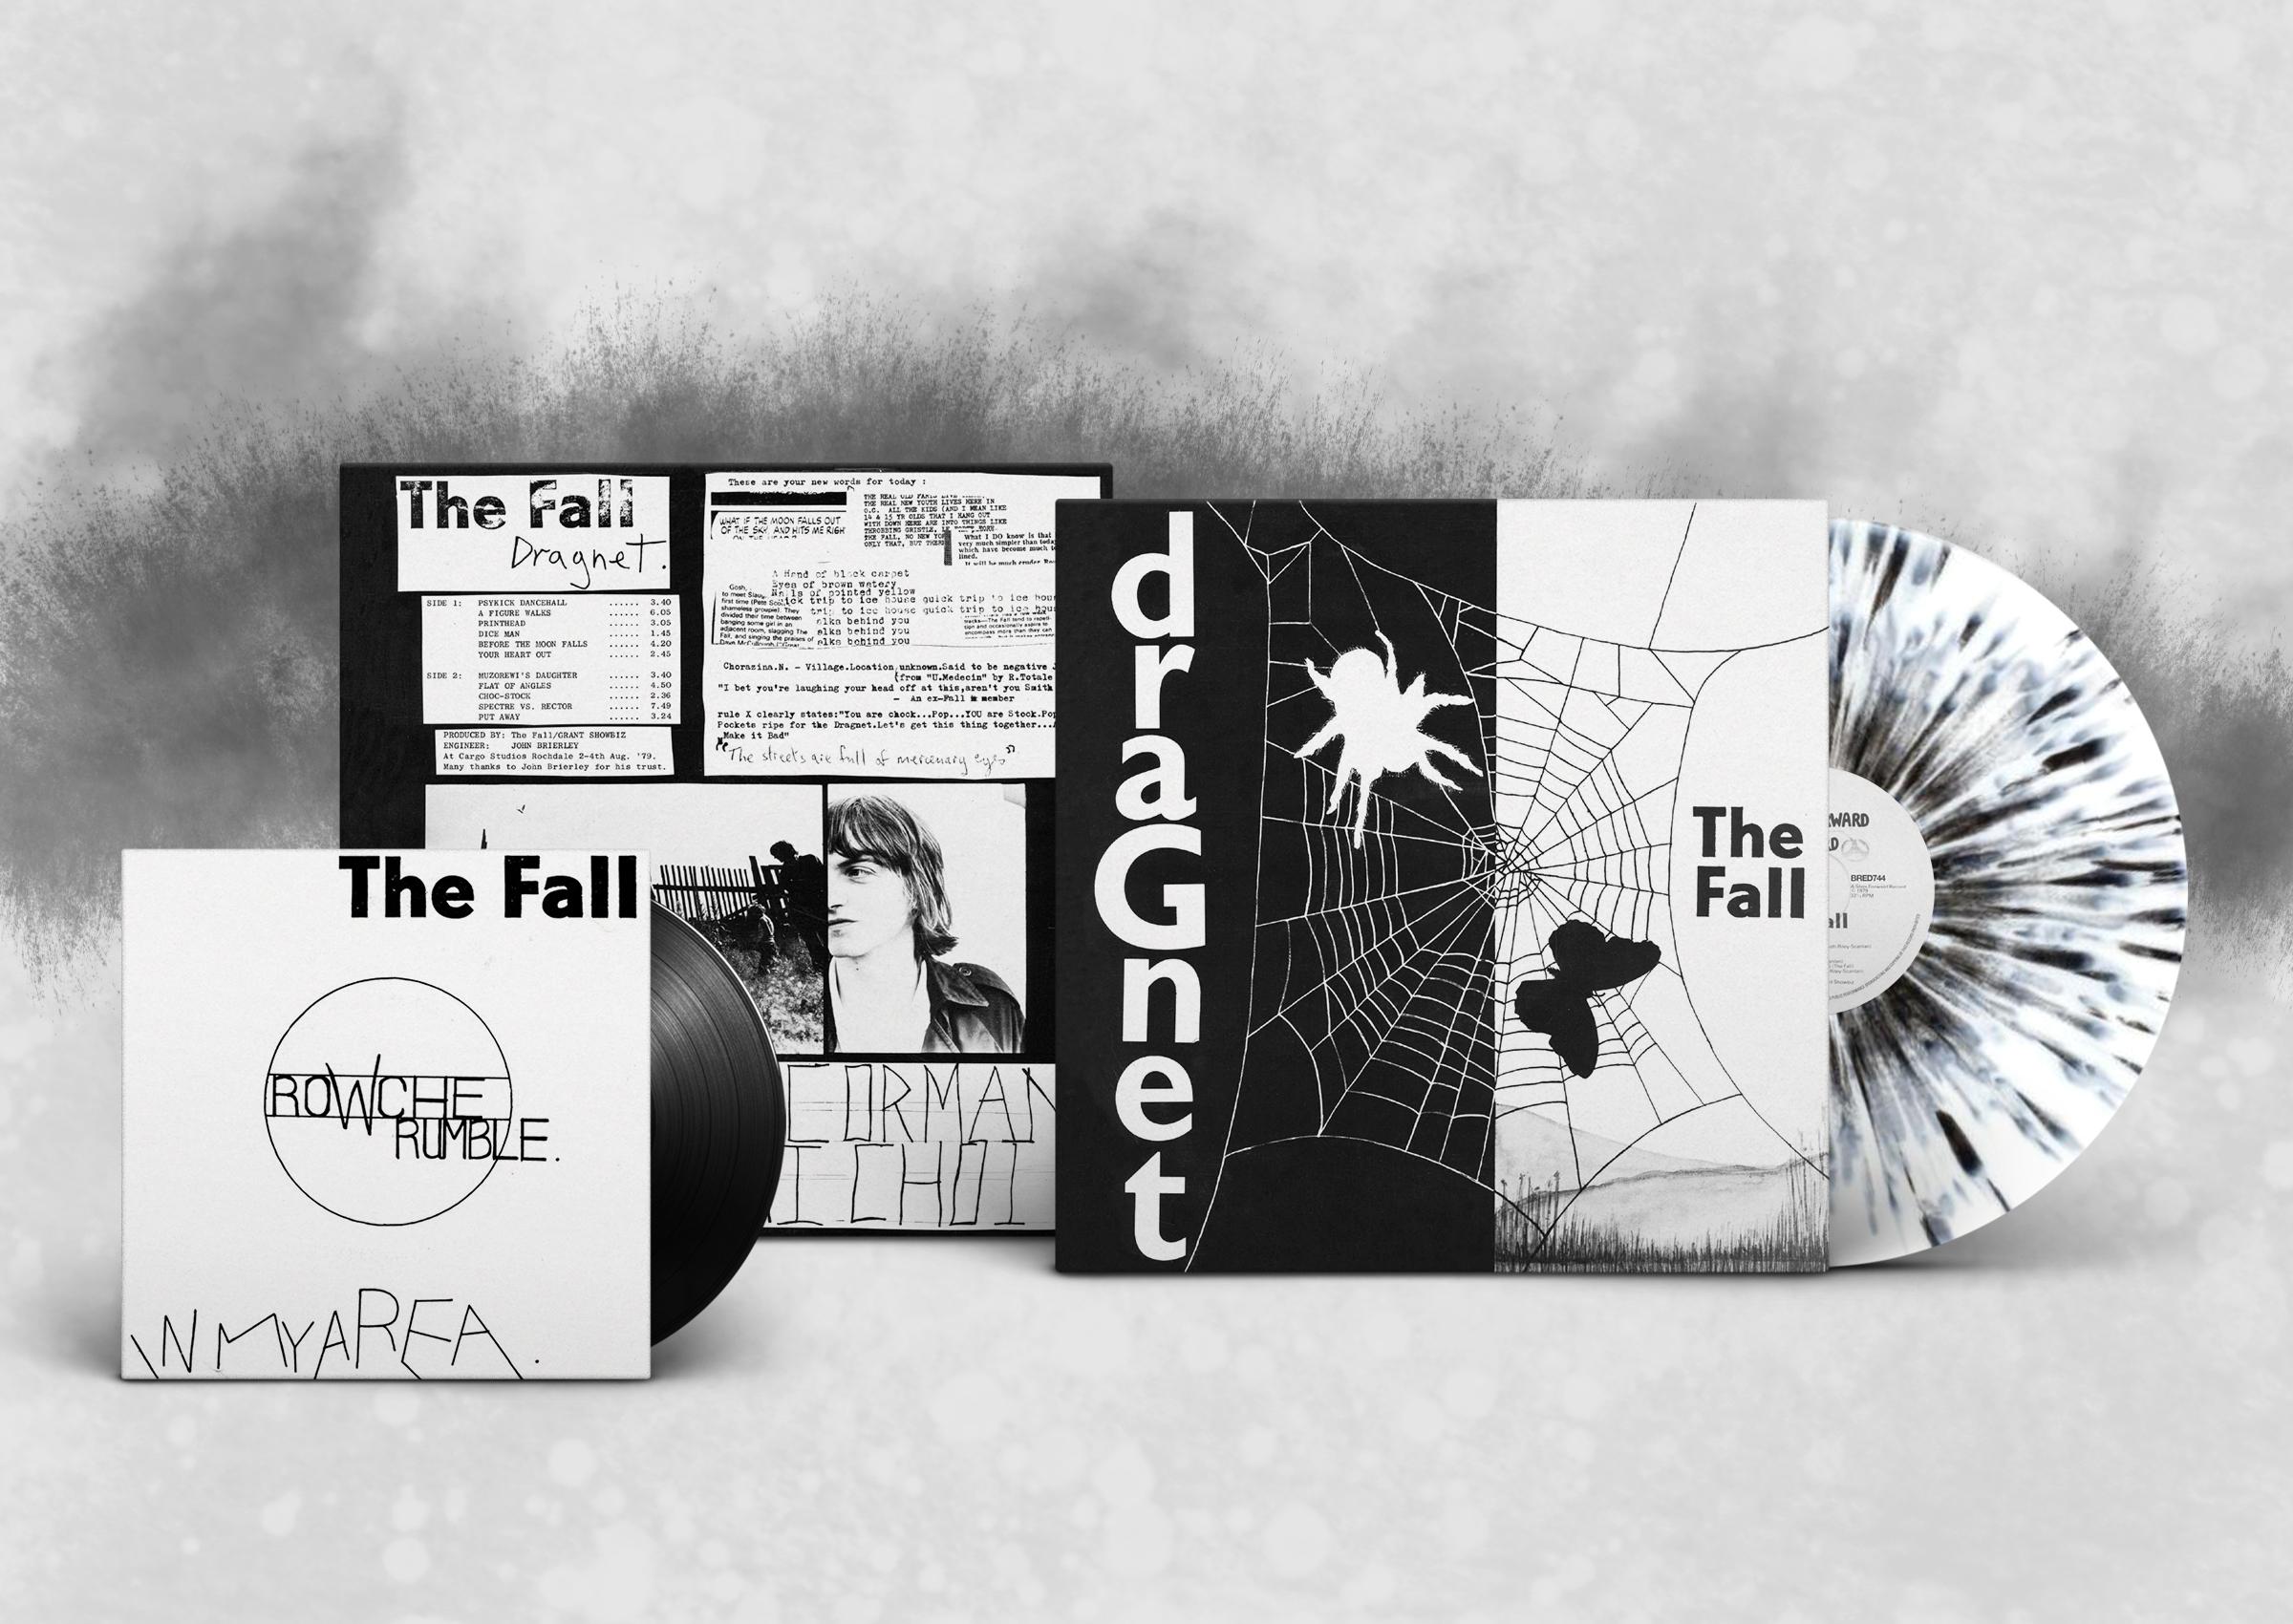 The fall dragnet limited edition black white splatter vinyl lp 7″ fall the